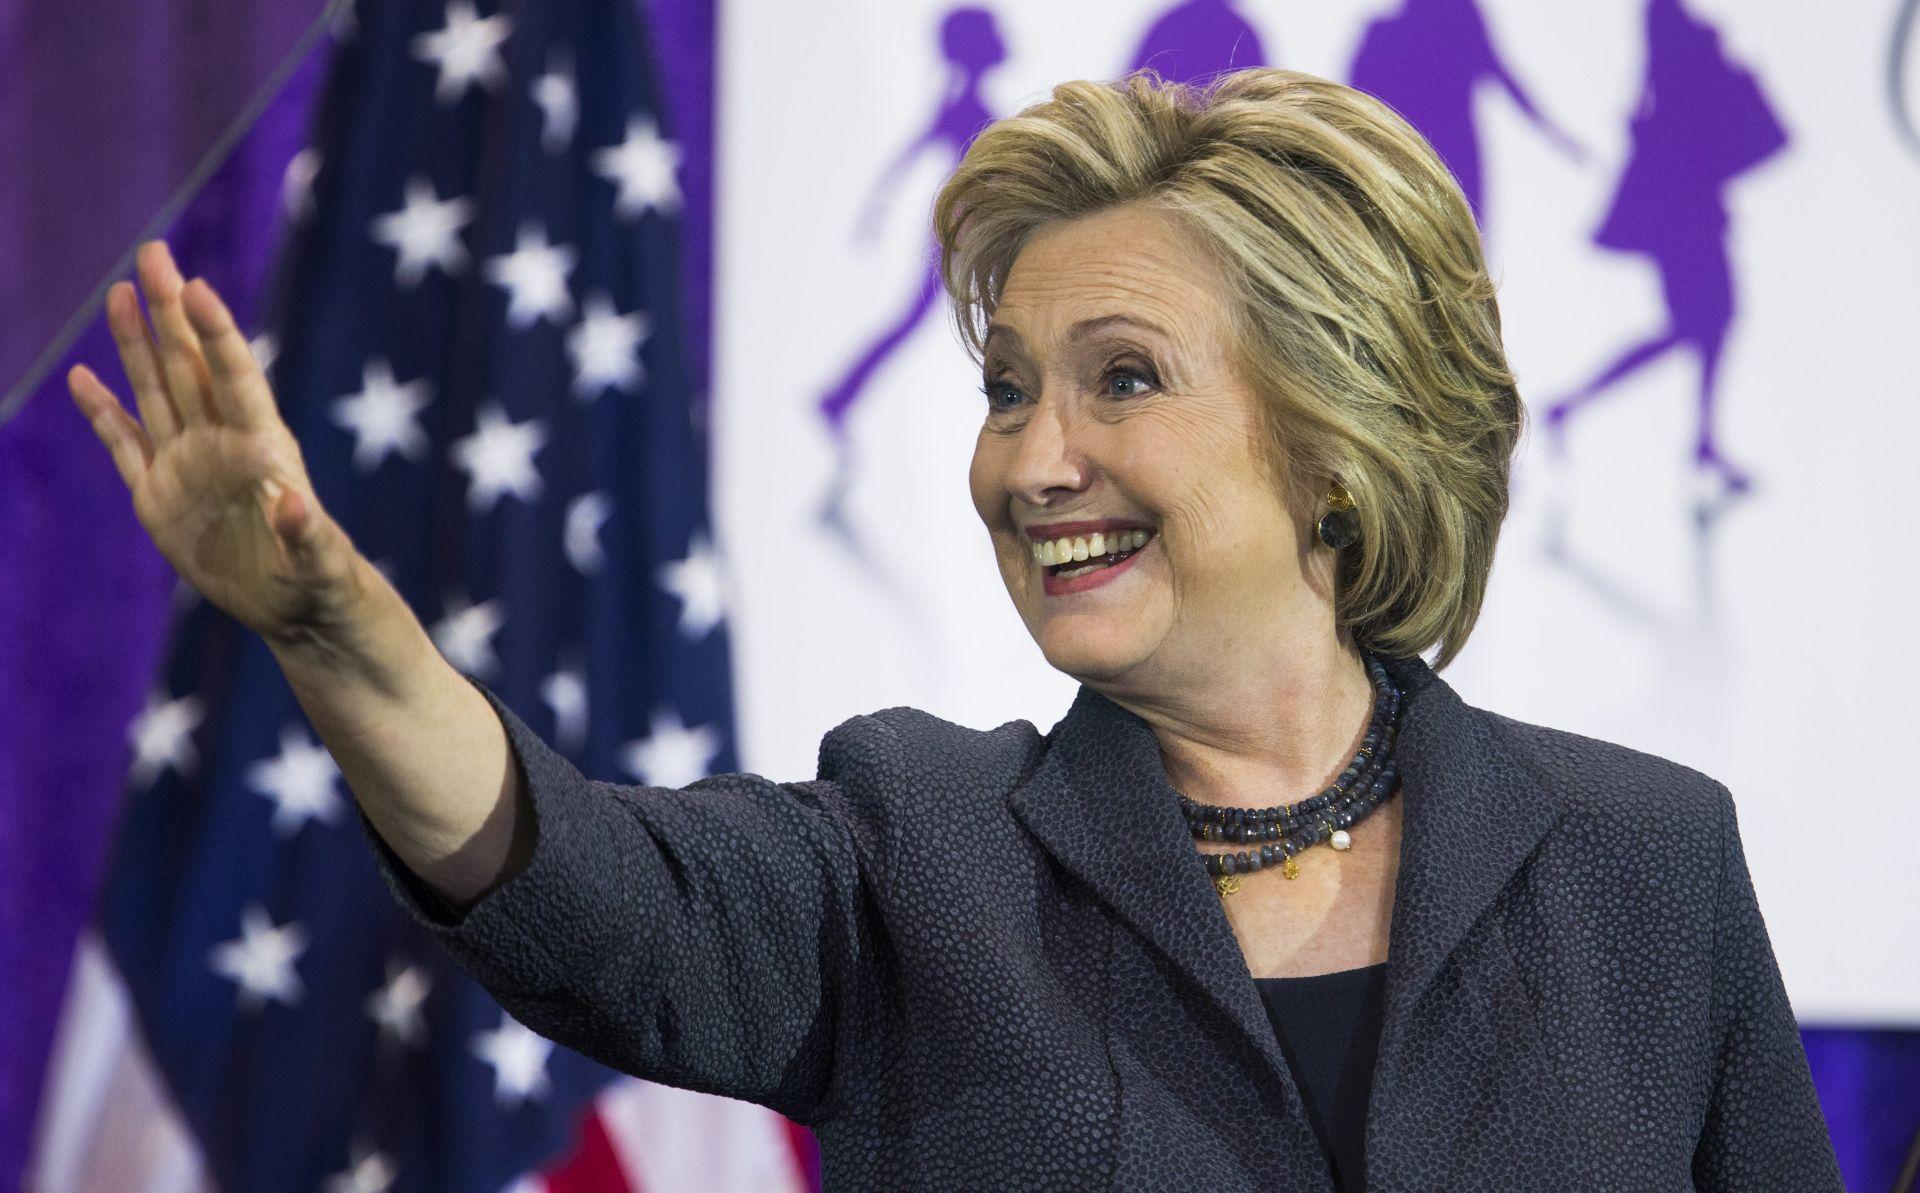 REZULTATI ANKETE: Clinton vodi ispred Trumpa na Floridi